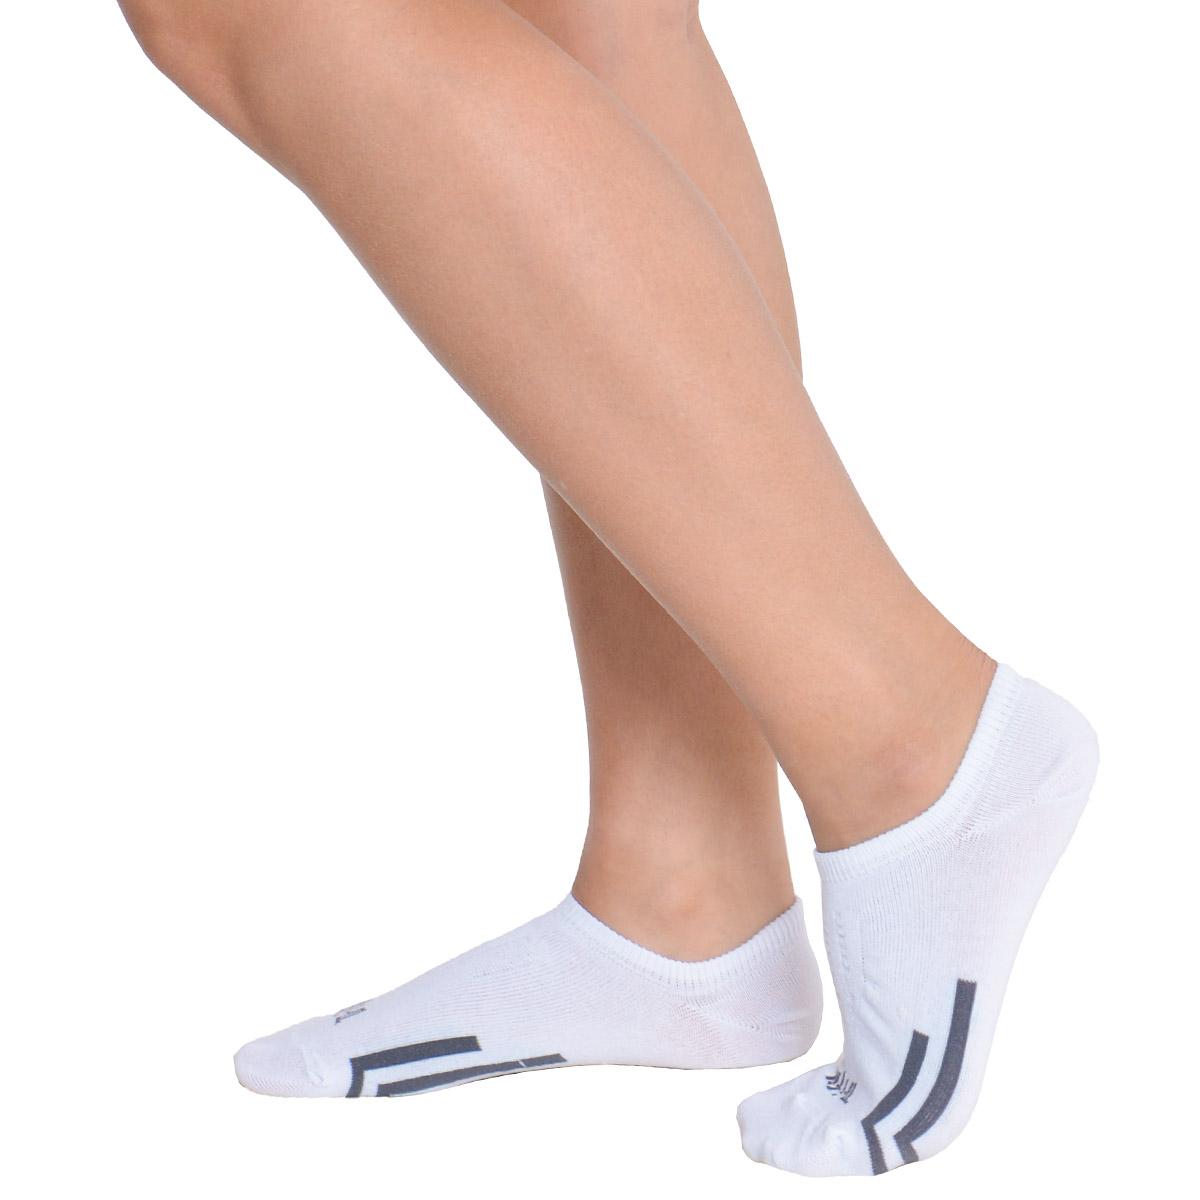 KIT com 3 meias invisível Trifil